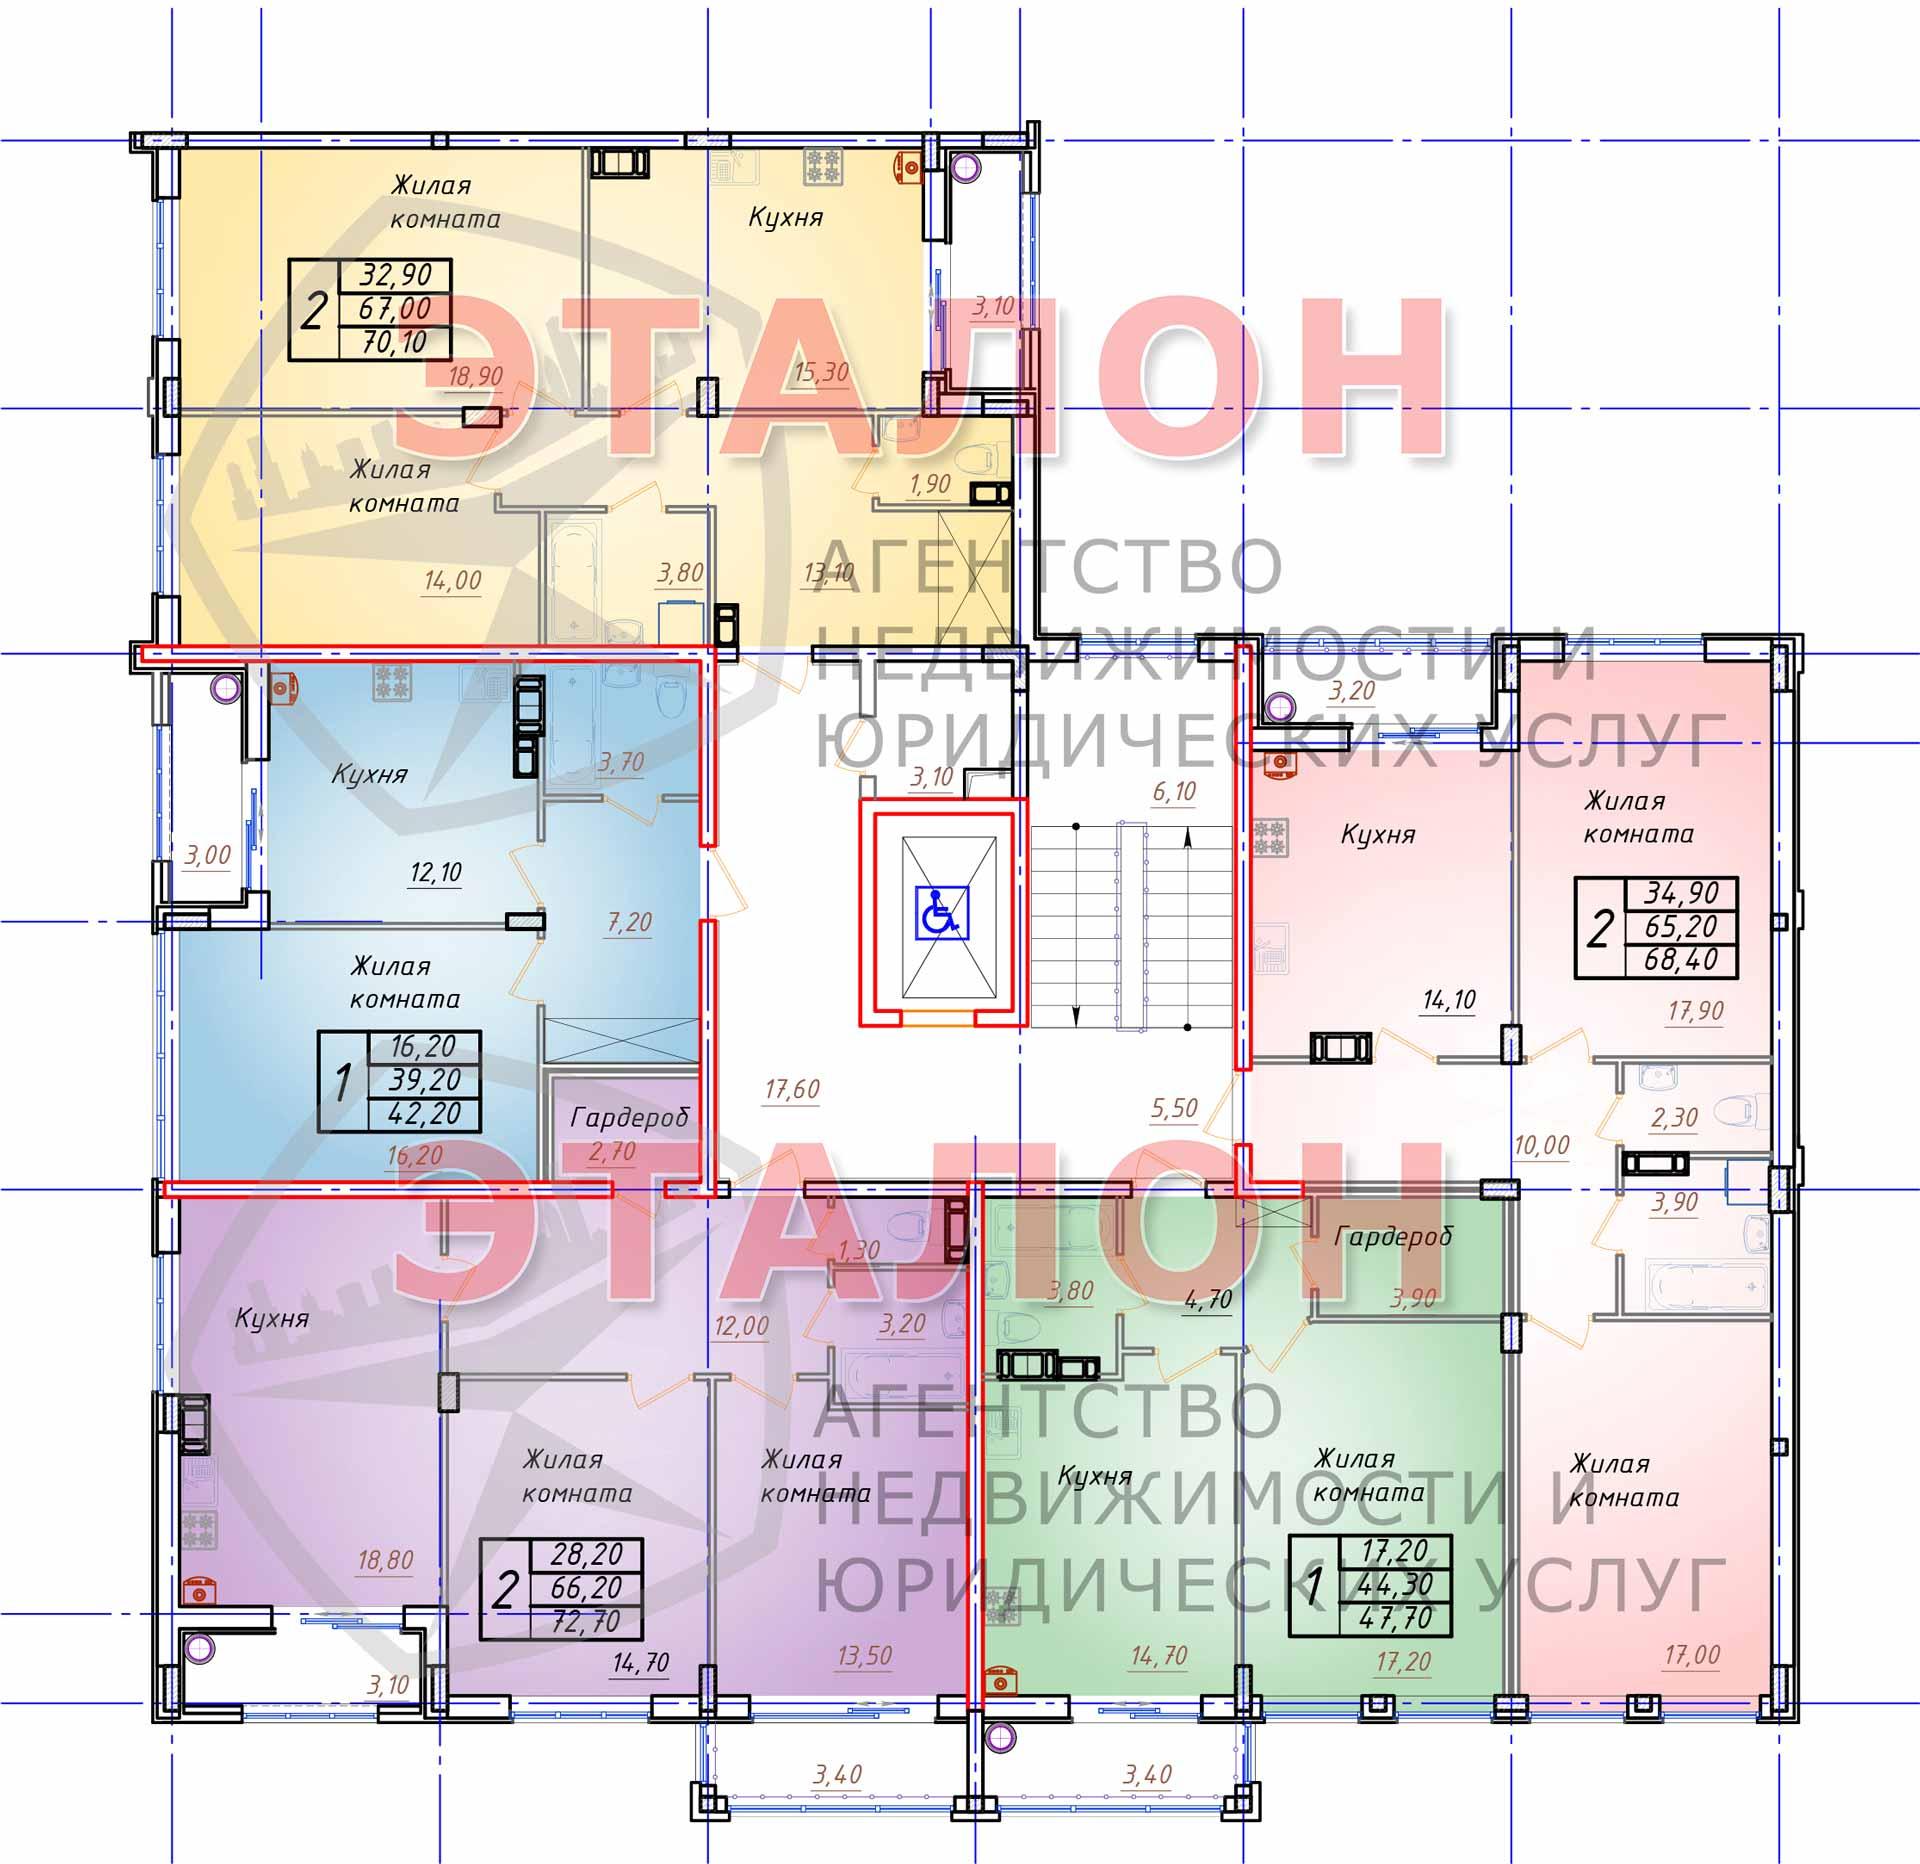 Блок 1. Подъезд 1. План 3-го этажа